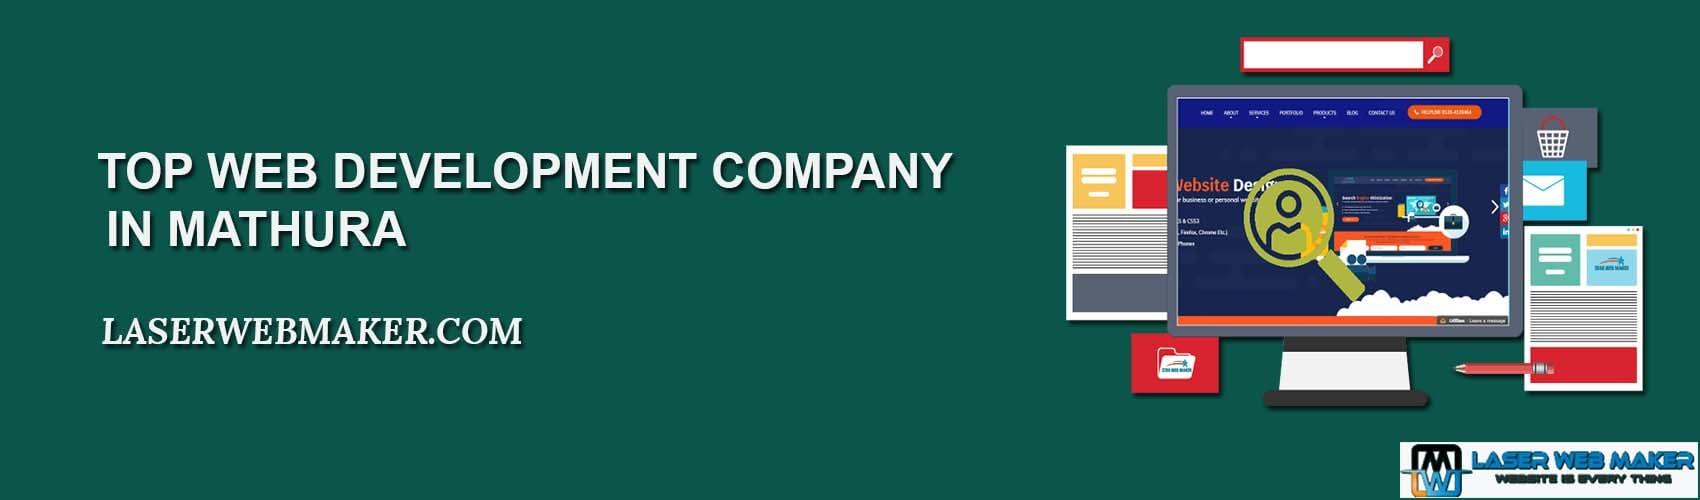 Top Web Development Company In Mathura